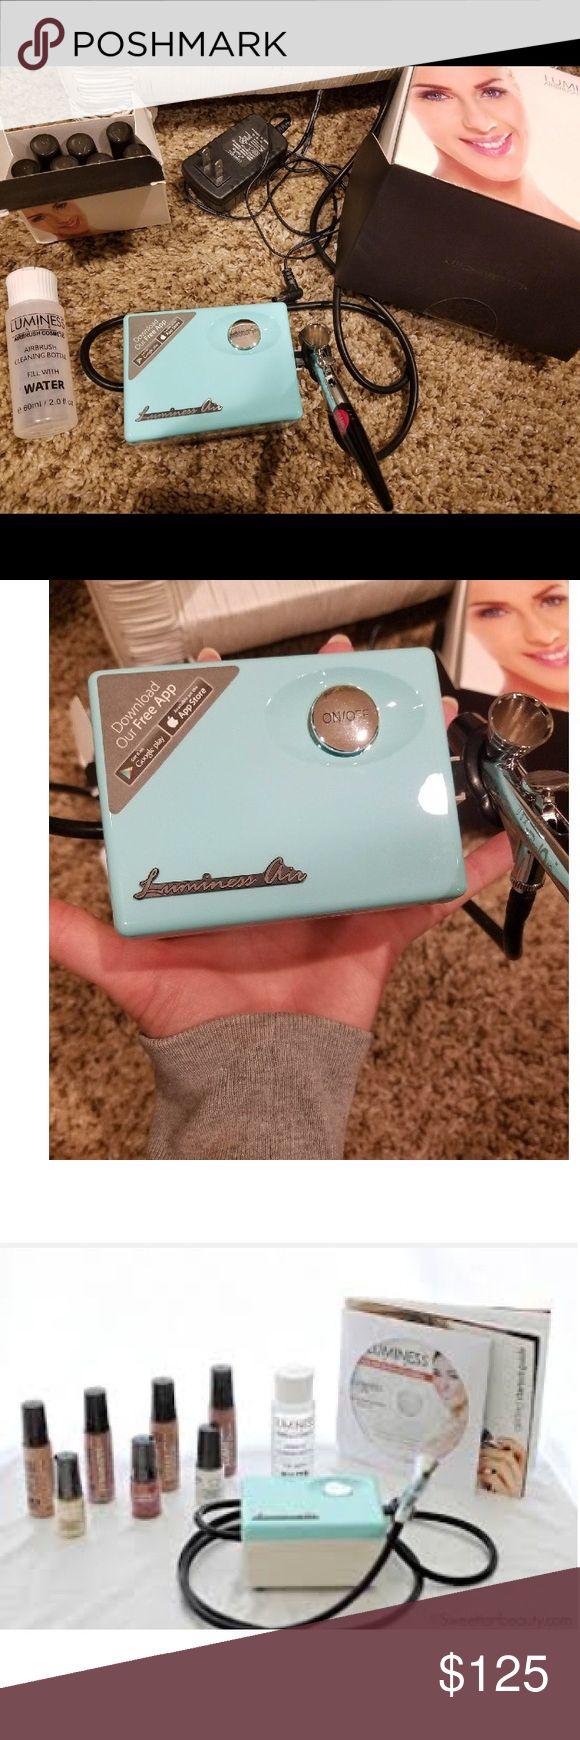 Luminess air brush machine NEW Airbrush cosmetics & skincare system new never used in box retails at $250 luminess airbrush Makeup Brushes & Tools